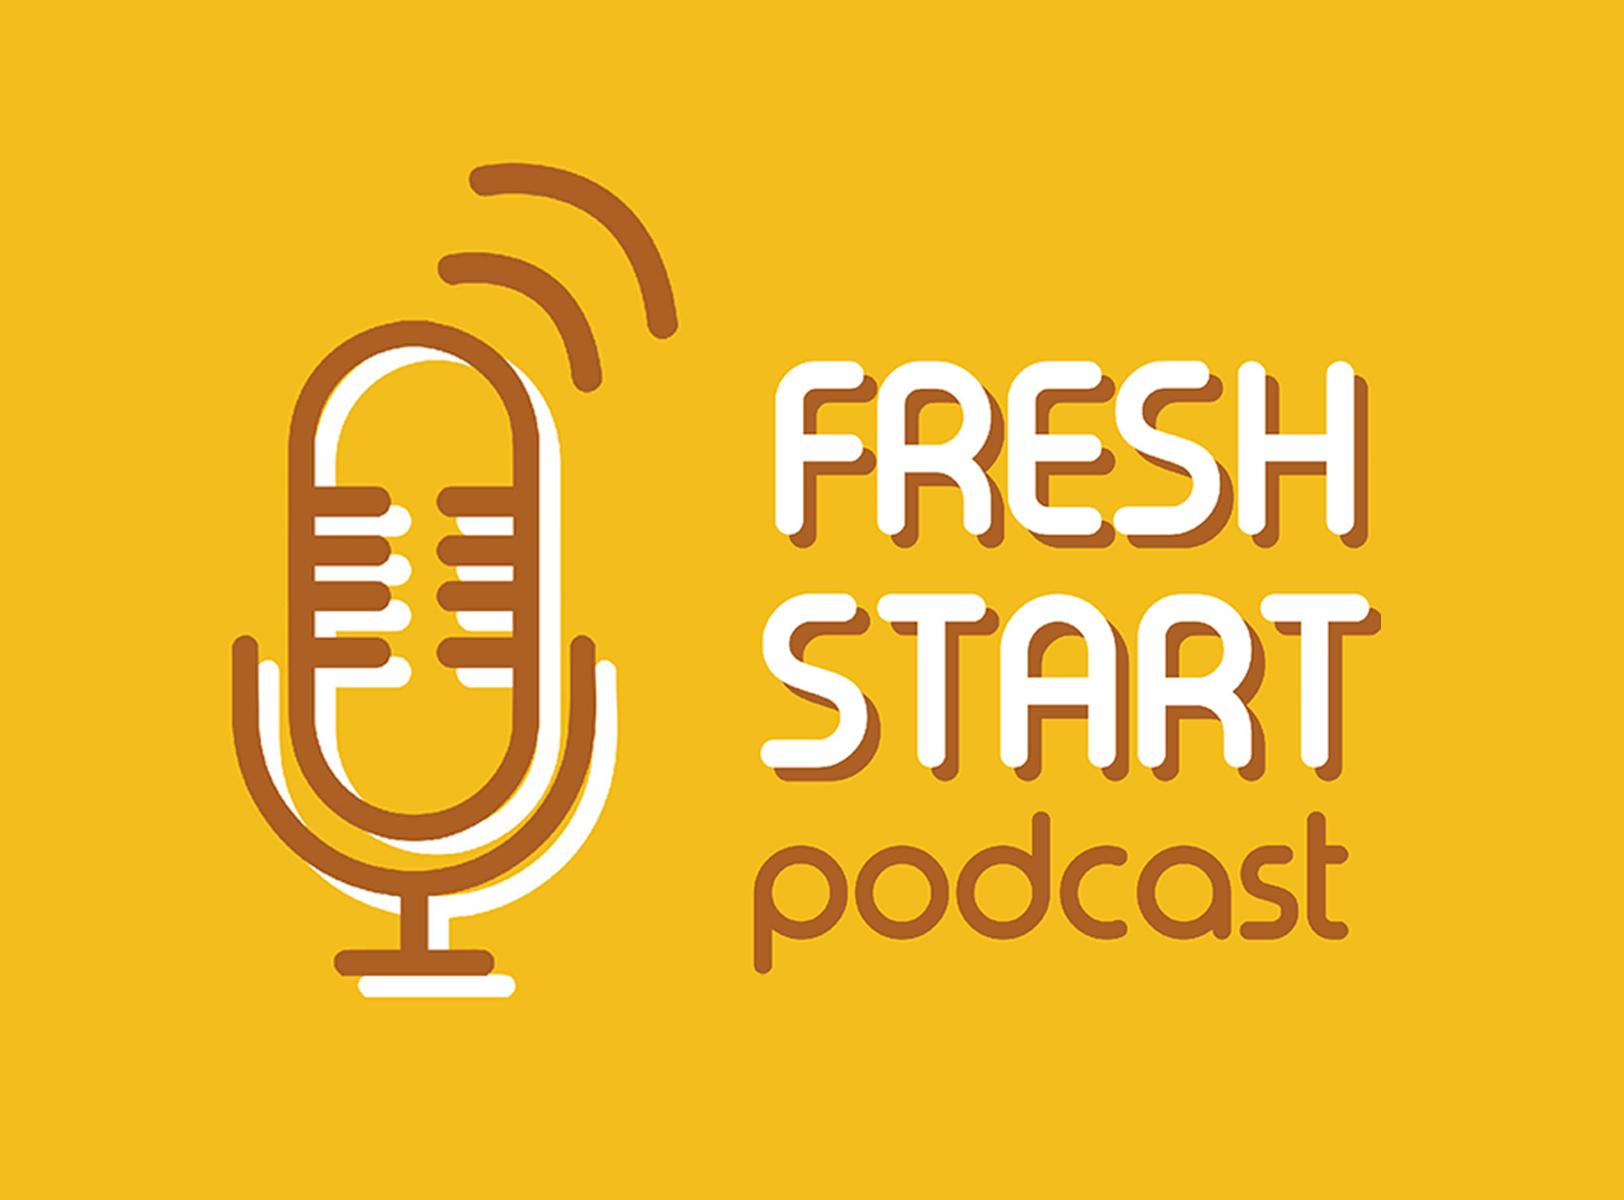 Fresh Start: Podcast News (6/12/2019 Wed.)